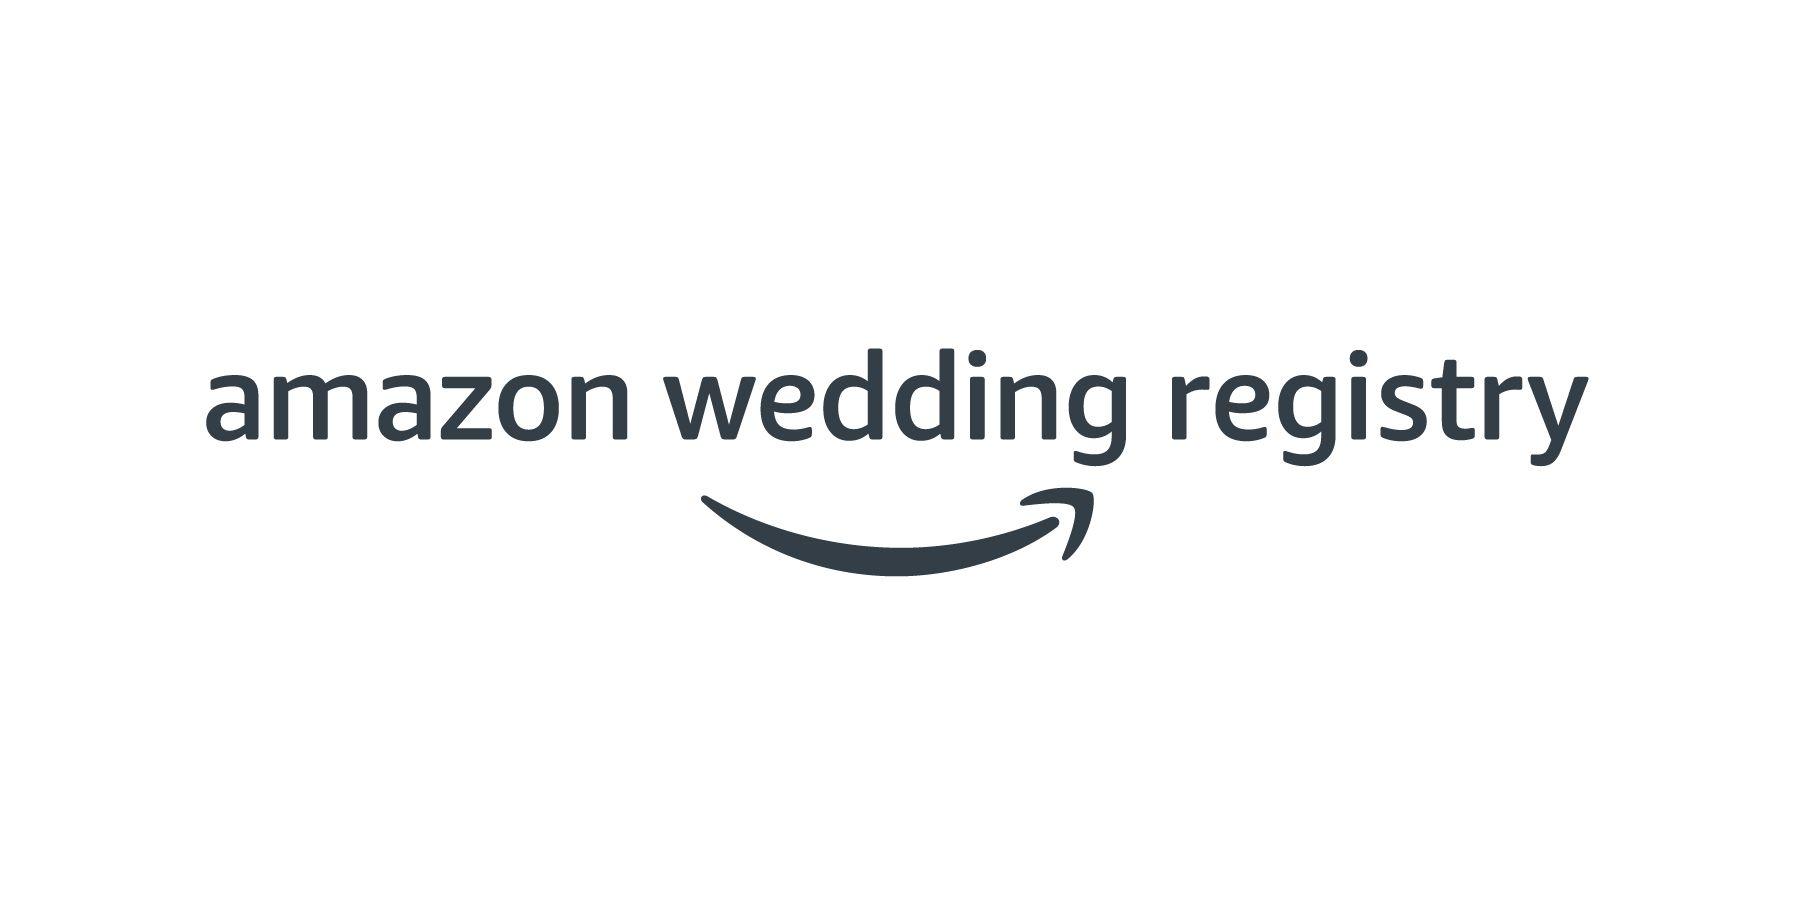 Amazon Wedding Registry  Amazon wedding registry, Wedding